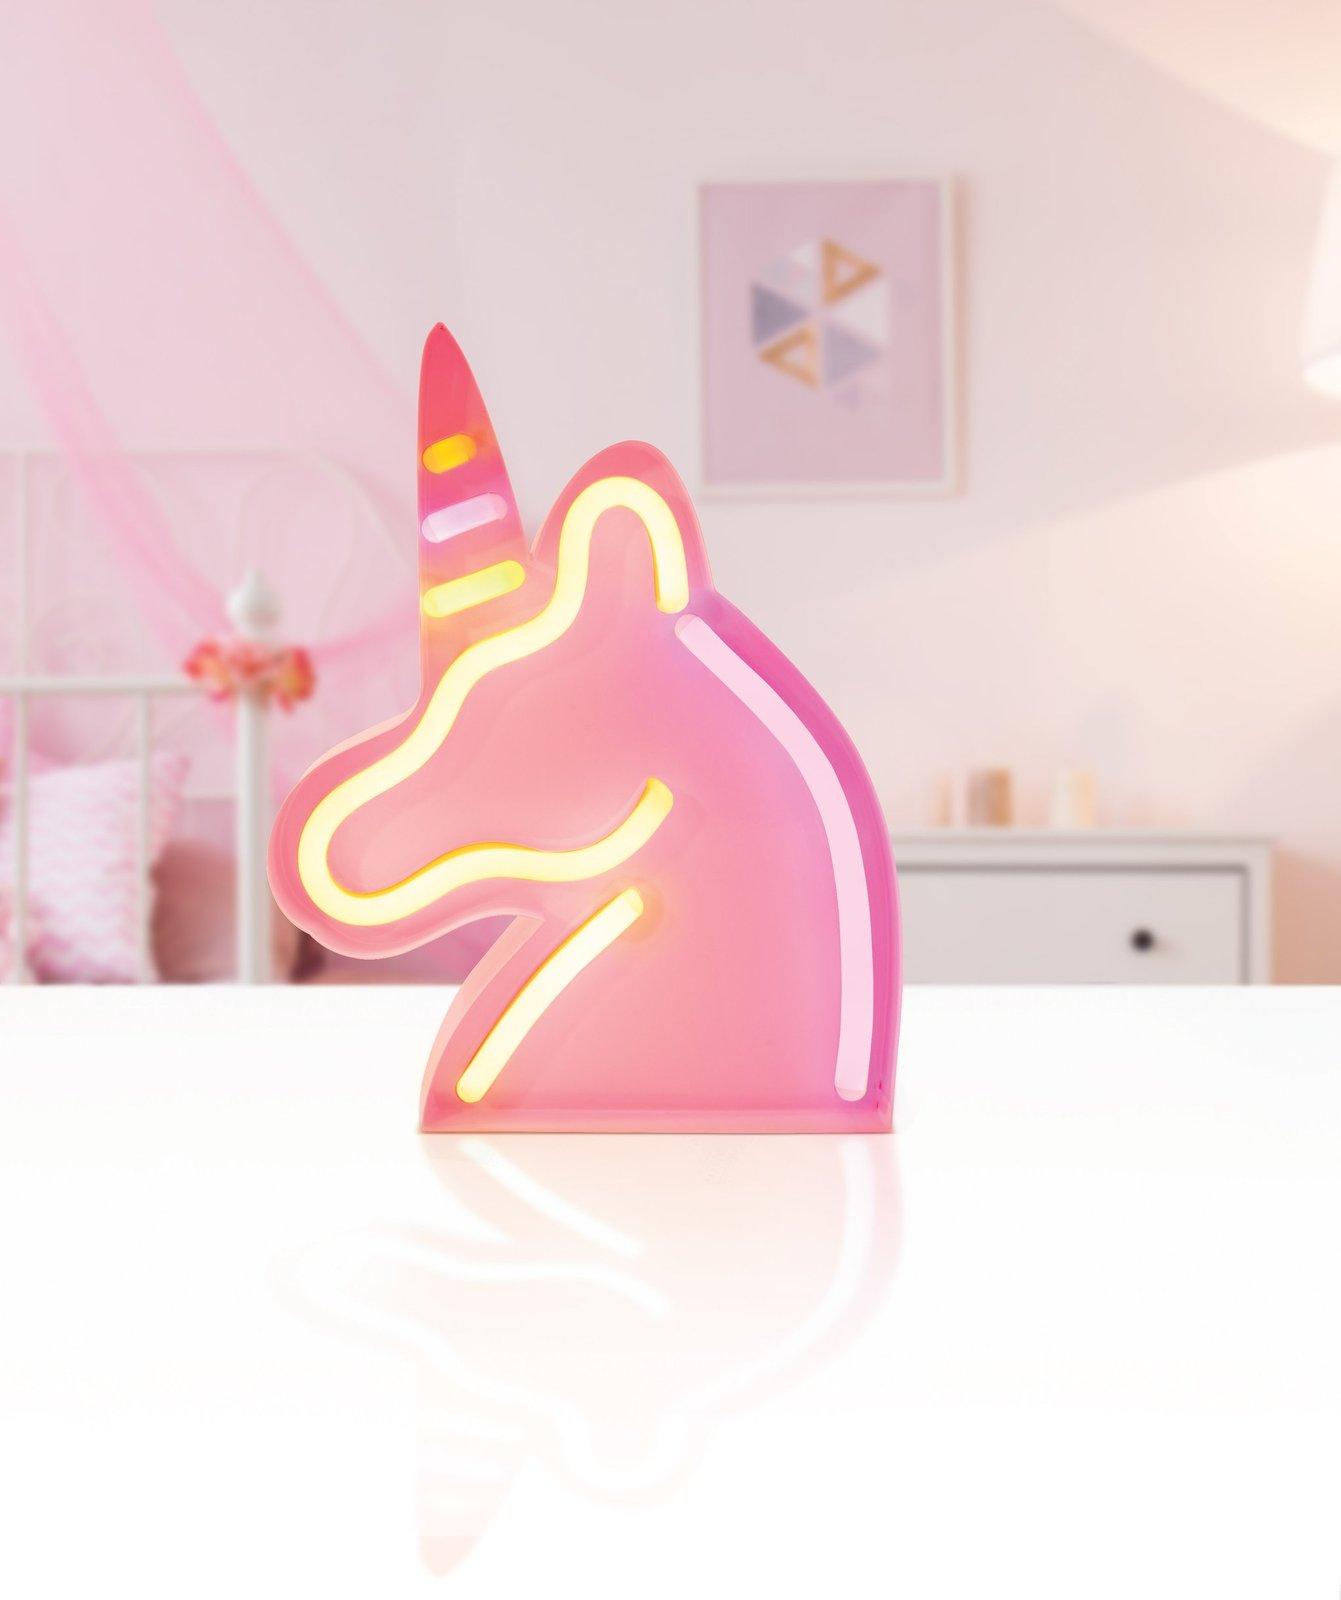 Neon Dreams - Unicorn Fantasy Light image